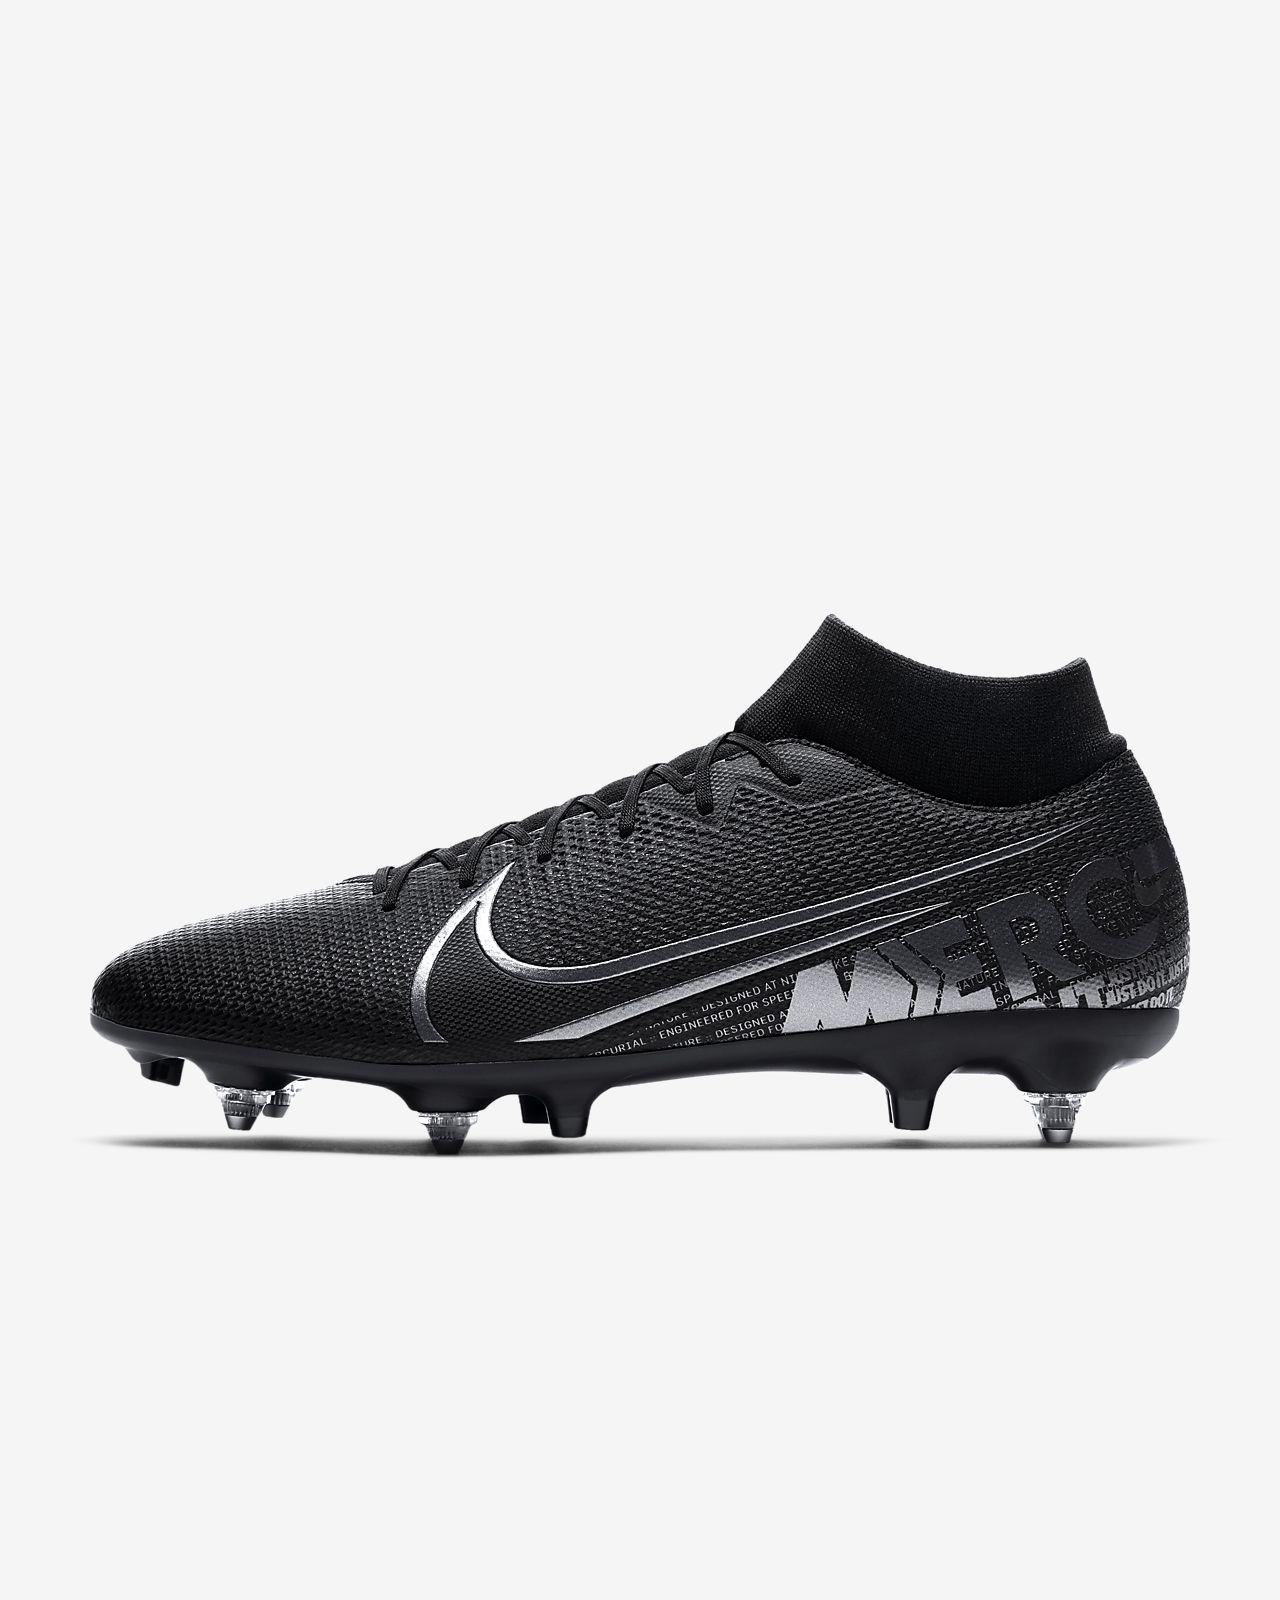 Nike Mercurial Superfly 7 Academy SG-PRO Anti-Clog Traction Botas de fútbol para terreno blando